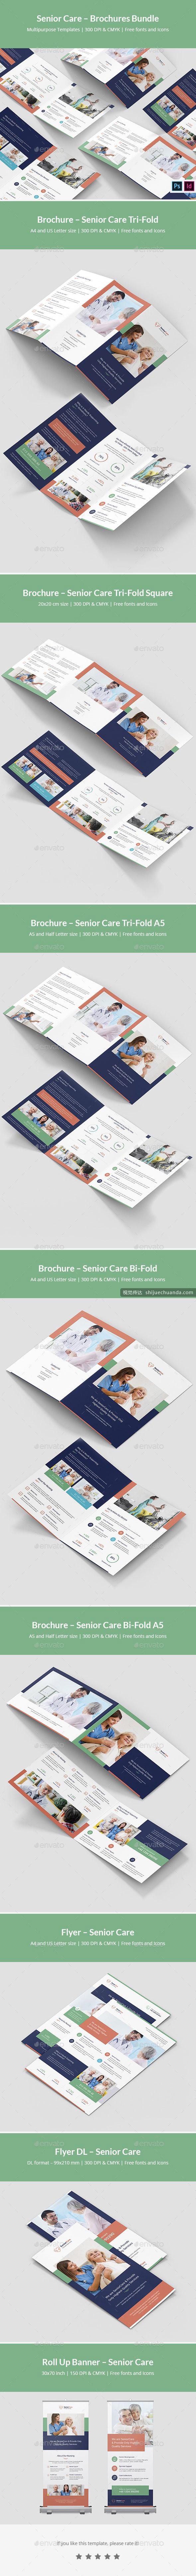 老年护理小册子平面设计模板 Senior Care Brochures Bundle Print Templates